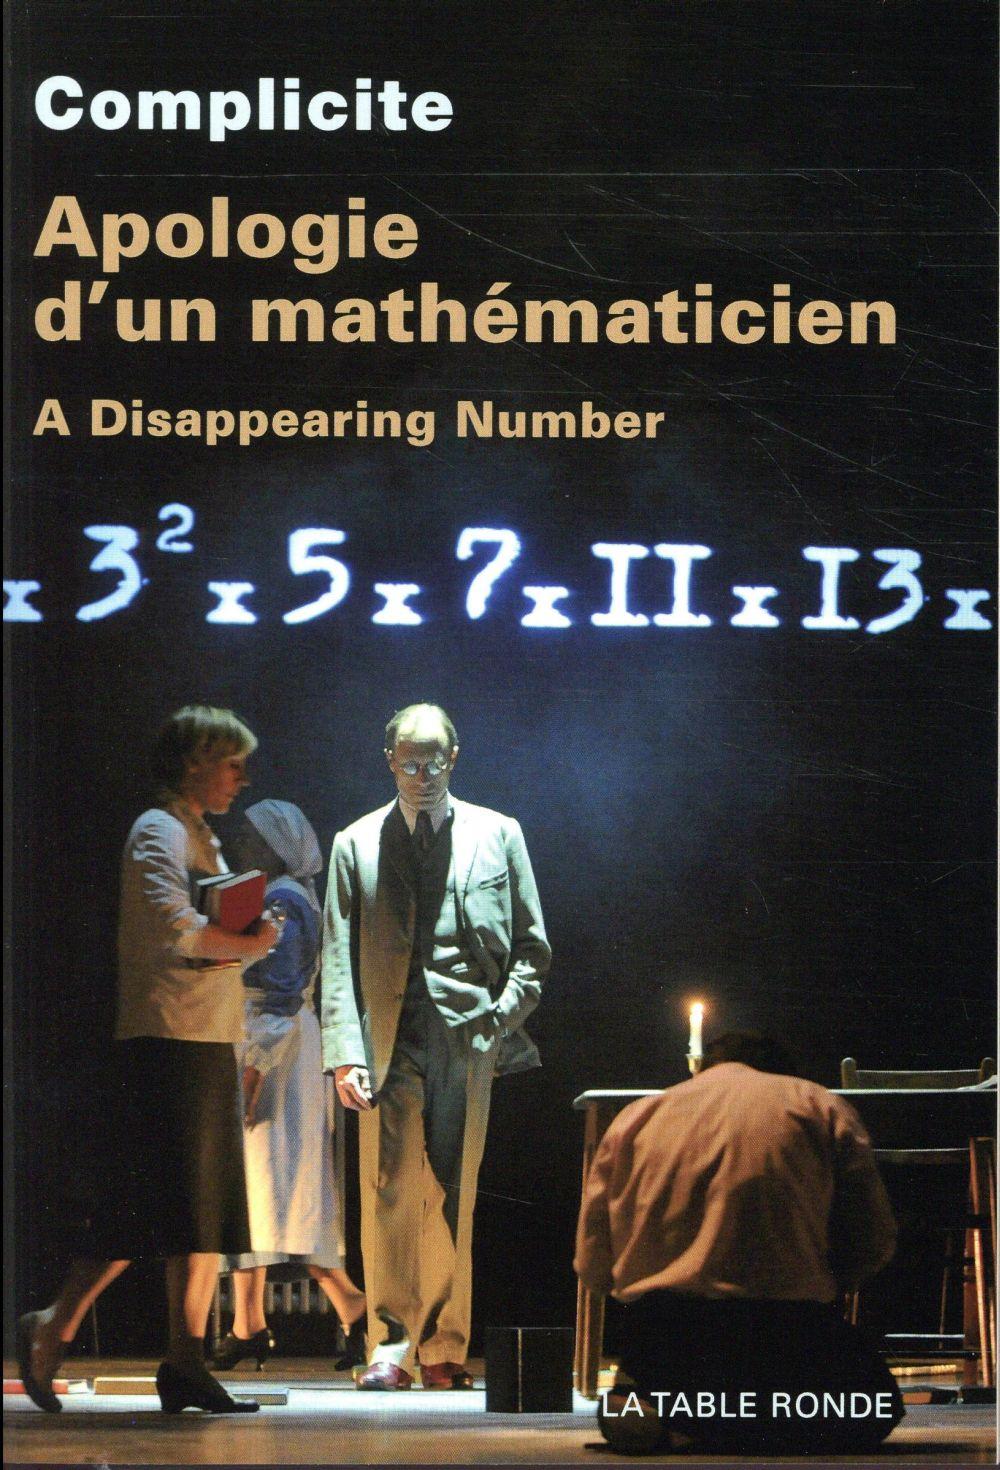 Apologie d'un mathématicien ; a disappearing number